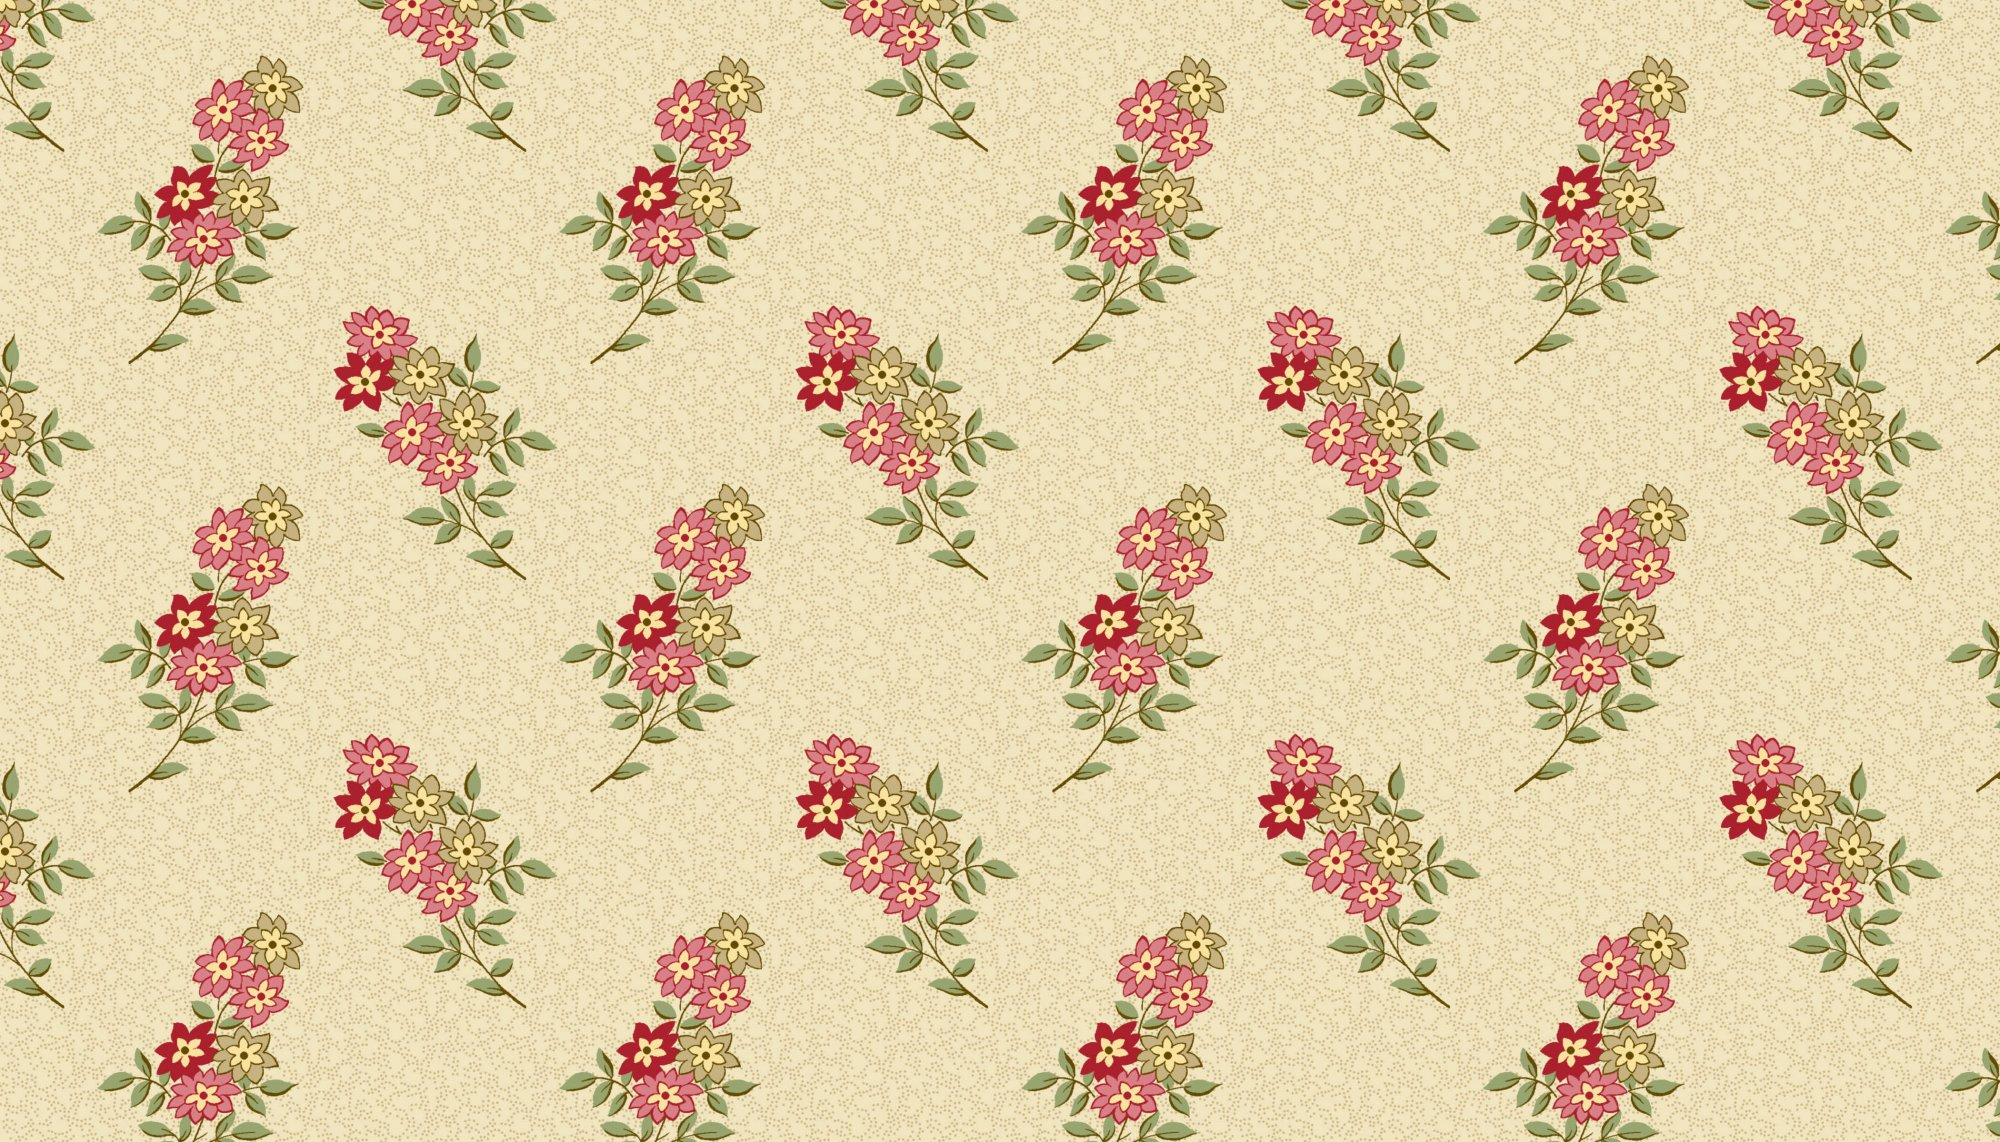 Andover - Nana's Flower Garden - 9533L